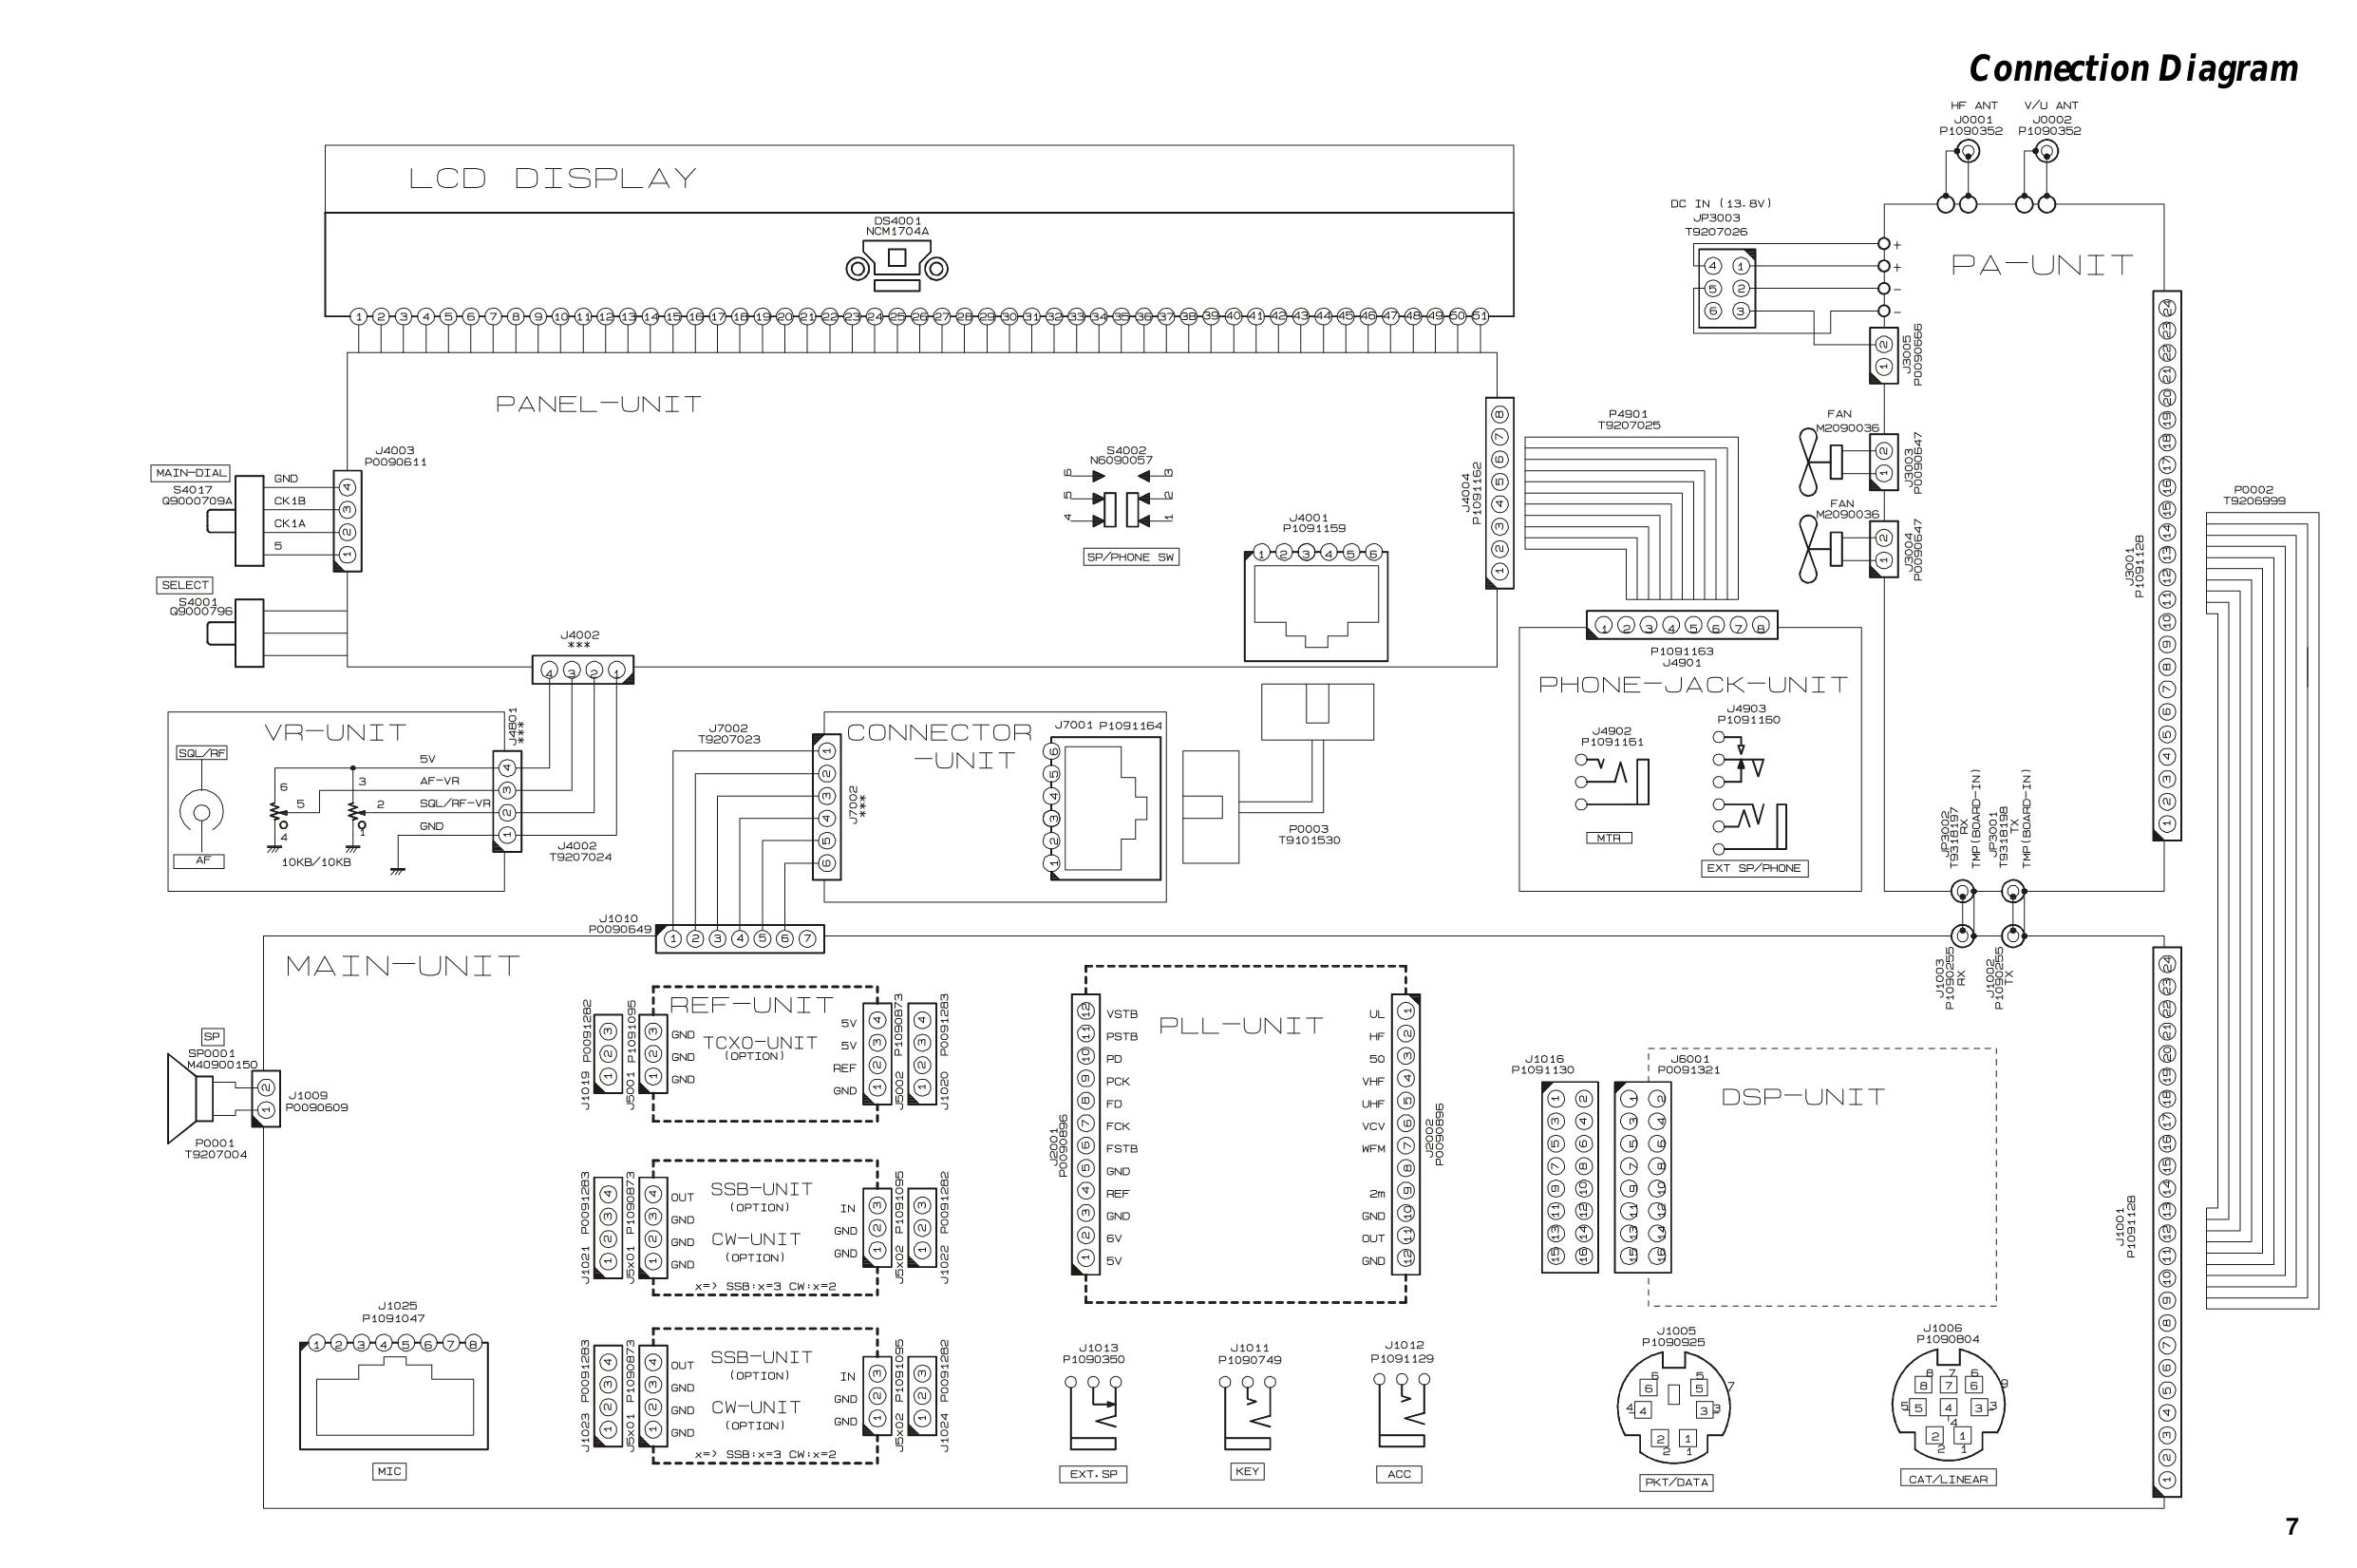 pdf manual for yaesu other ft 857d hf transceiver rh umlib com yaesu ft 857 service manual yaesu ft-857d service manual pdf